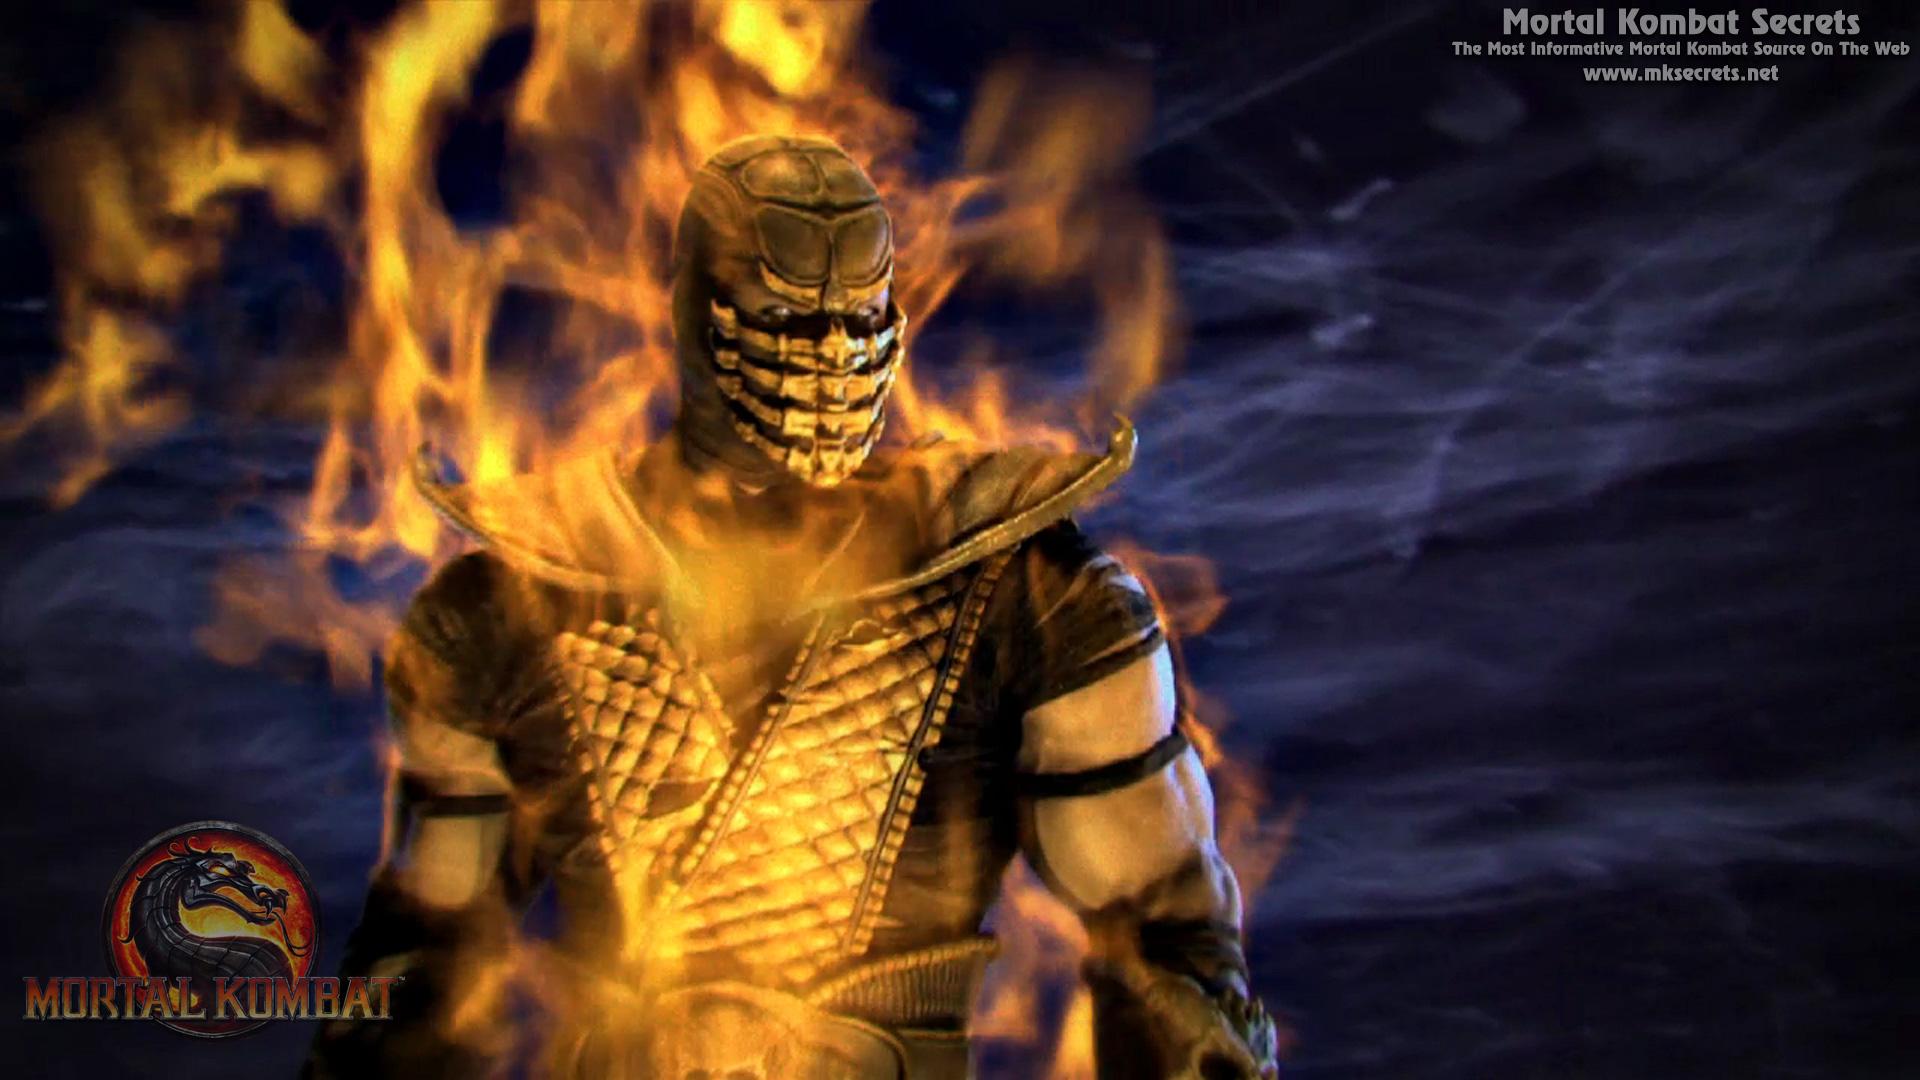 Mortal Kombat Images Mileena Hd Wallpaper And Background Photos